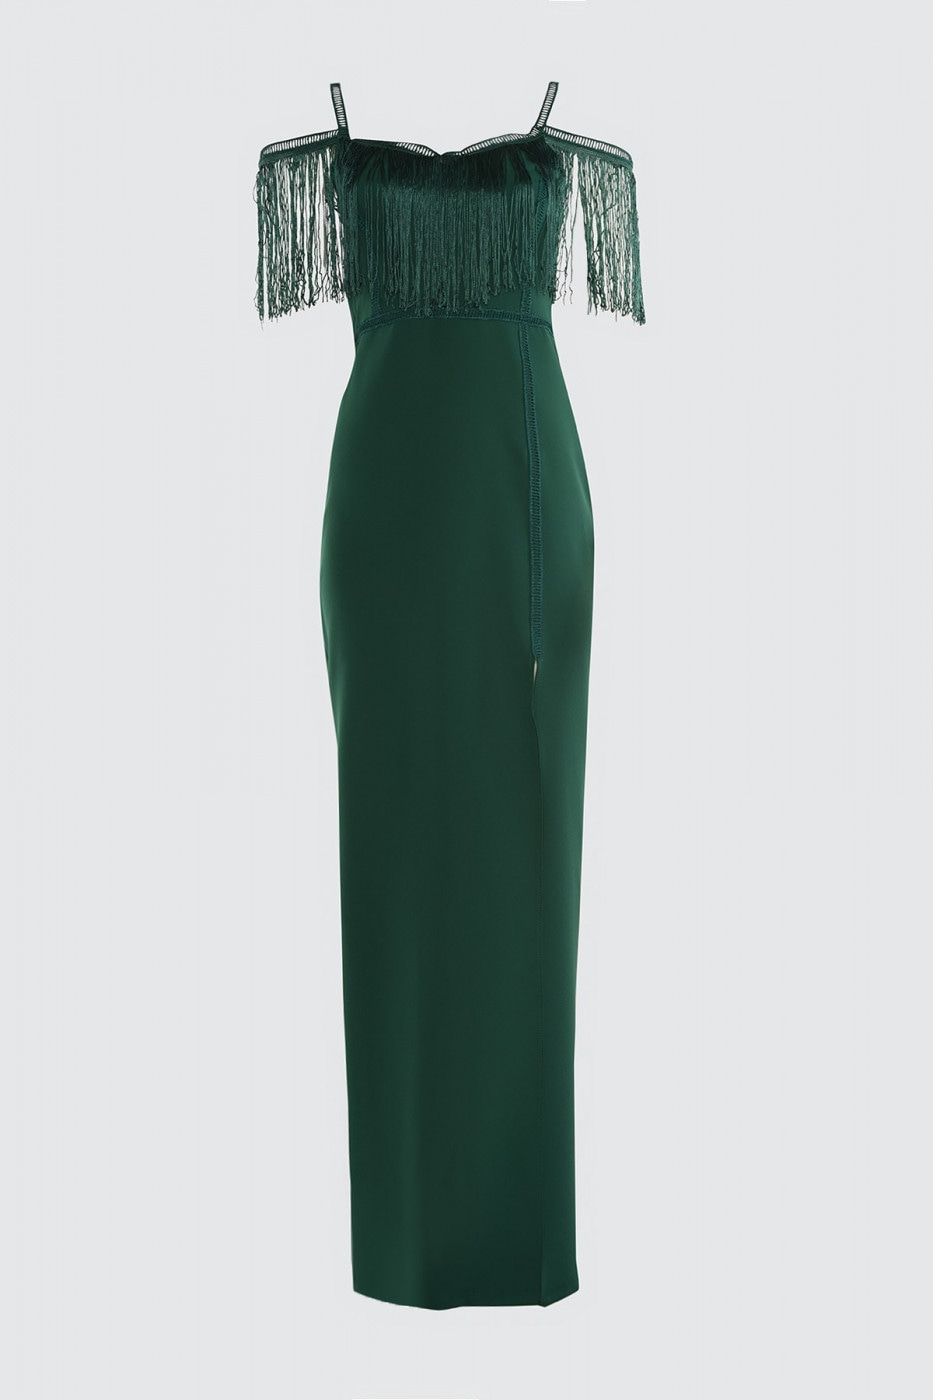 Trendyol Evening Dress with Emerald Green Tassel Detailed Slit & Graduation Dress